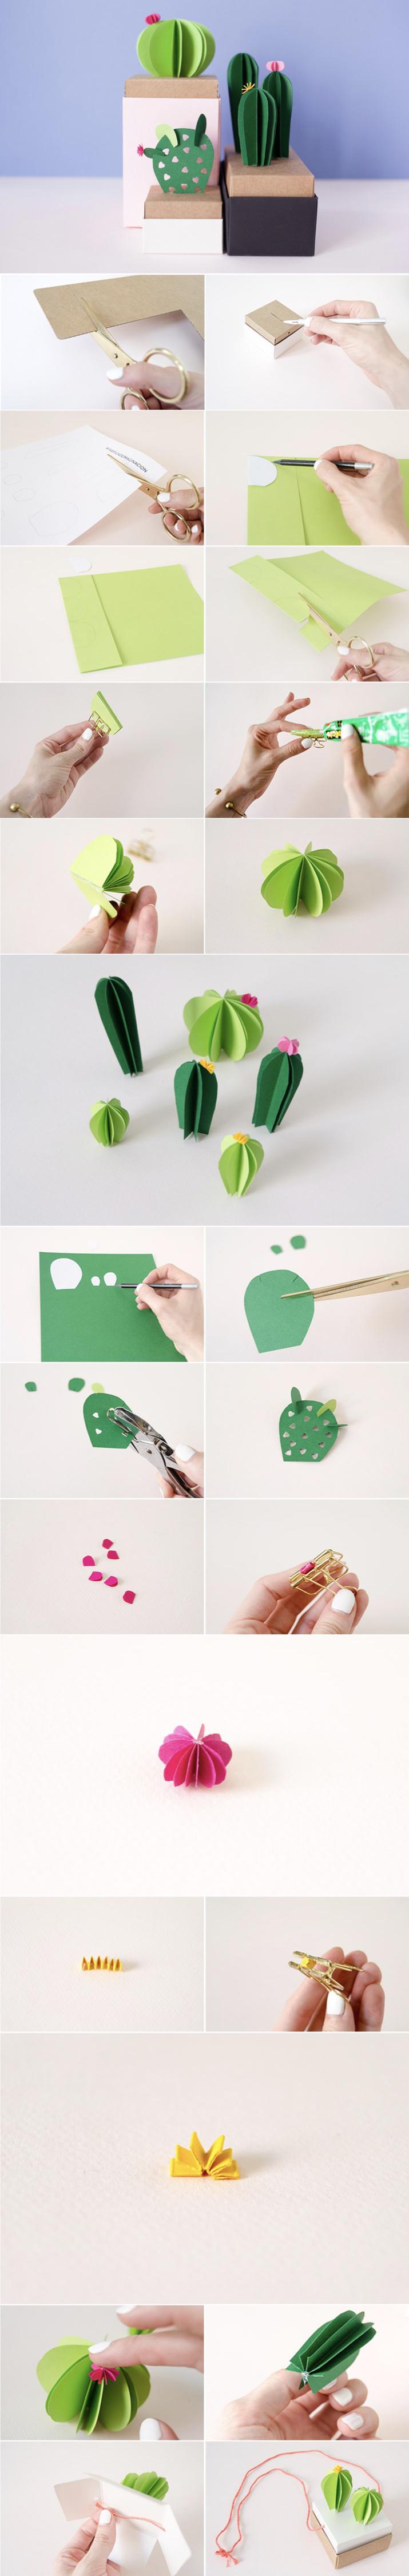 plante en papier cactus diy original - blog déco - clem around the corner